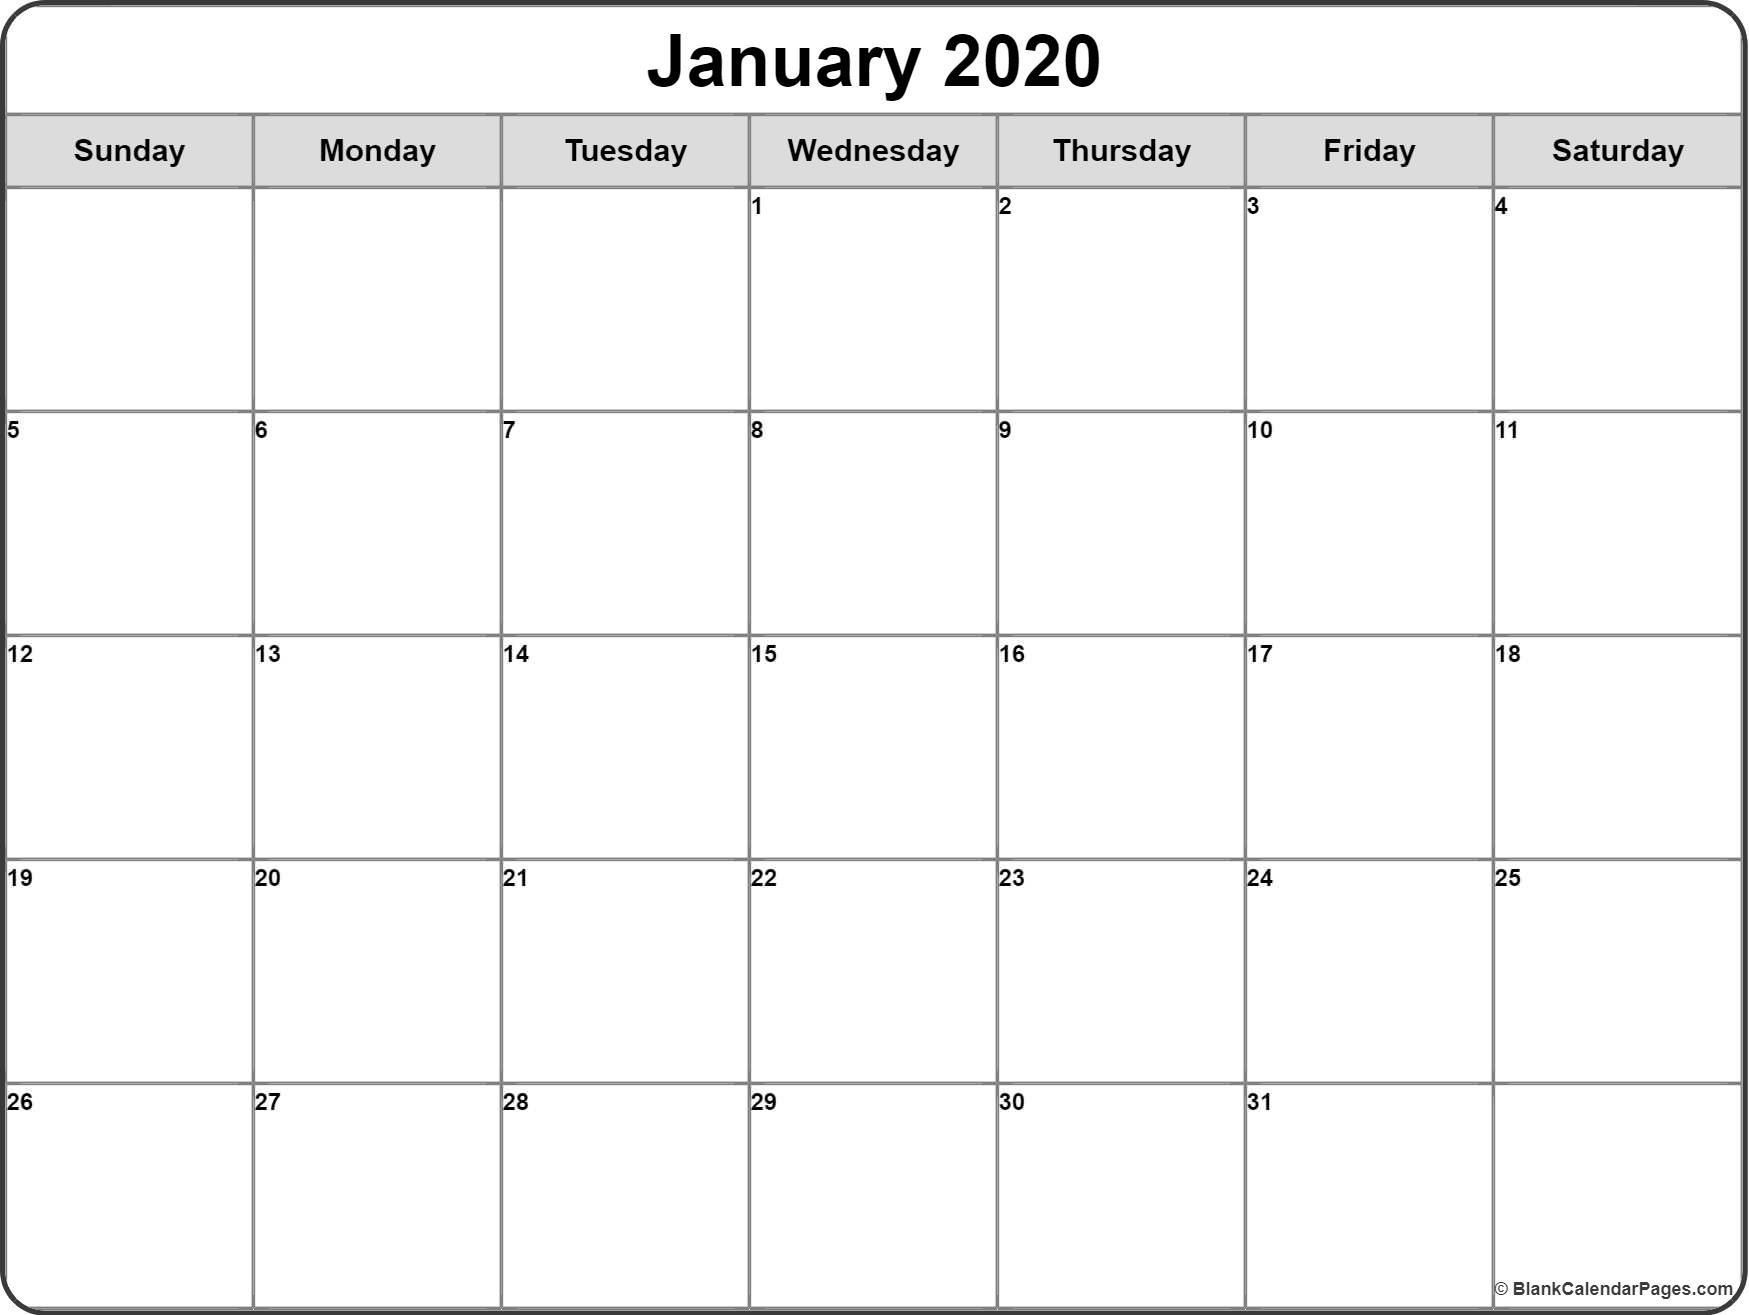 January 2020 Calendar | Free Printable Monthly Calendars-2 Page Monthly Calendar 2020 Printable Free